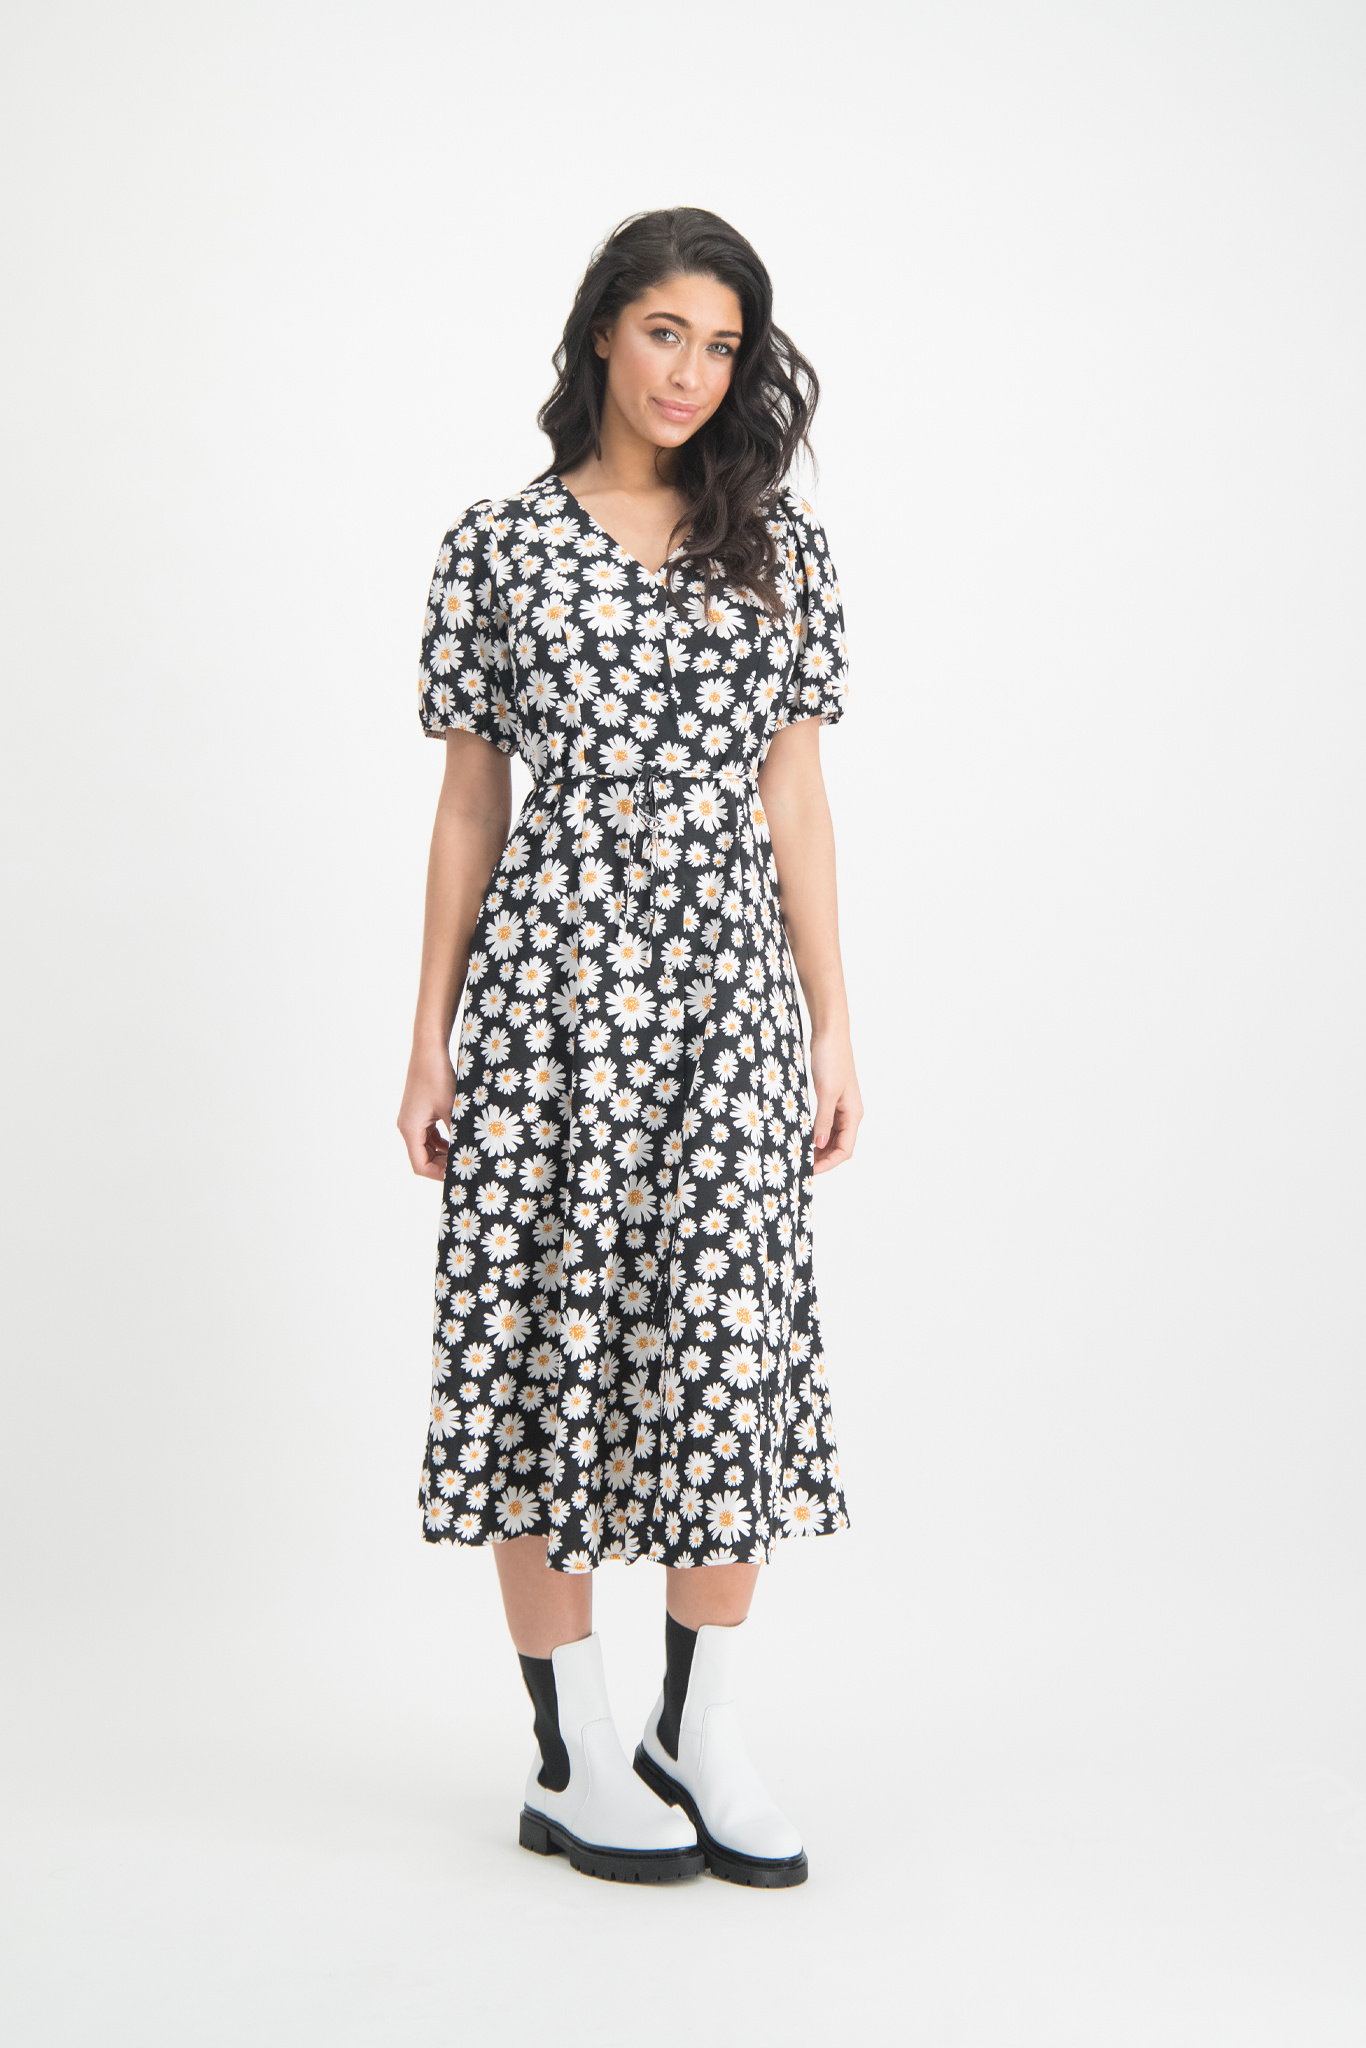 Lofty Manner Black Maxi Dress Myllena